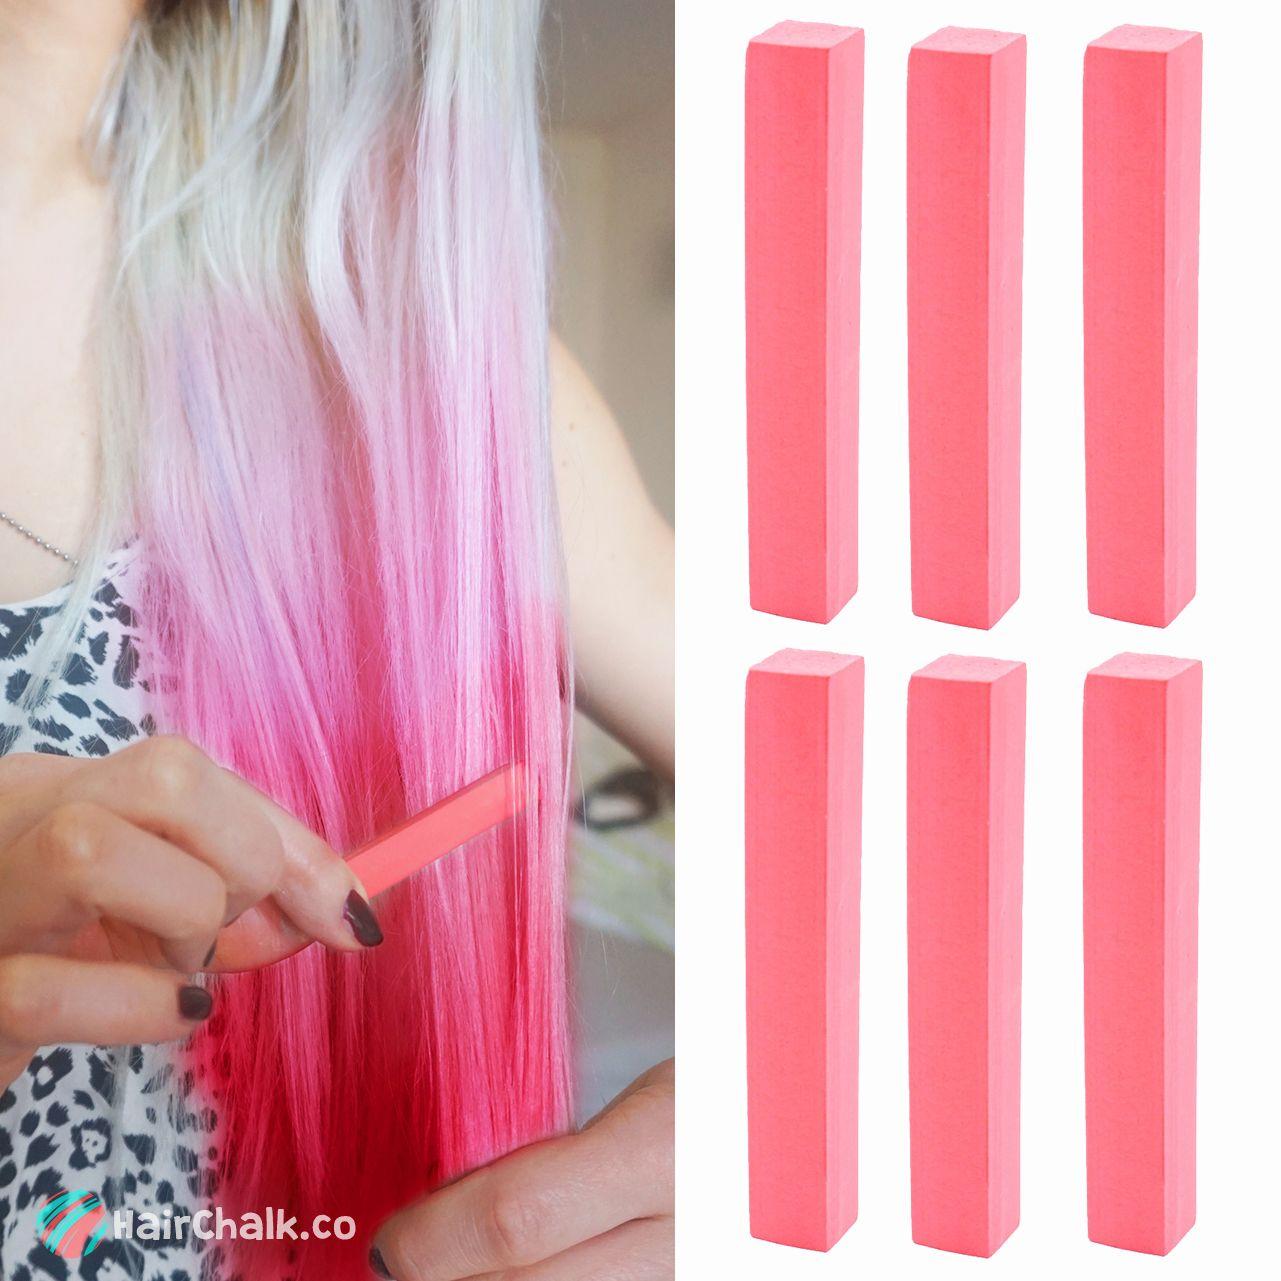 Best Candy Apple Pale Red Hair Dye Raspberry Pink Hair Dye Hairchalk Set Of 6 Pink Hair Dye Hair Chalk Dark Pink Hair